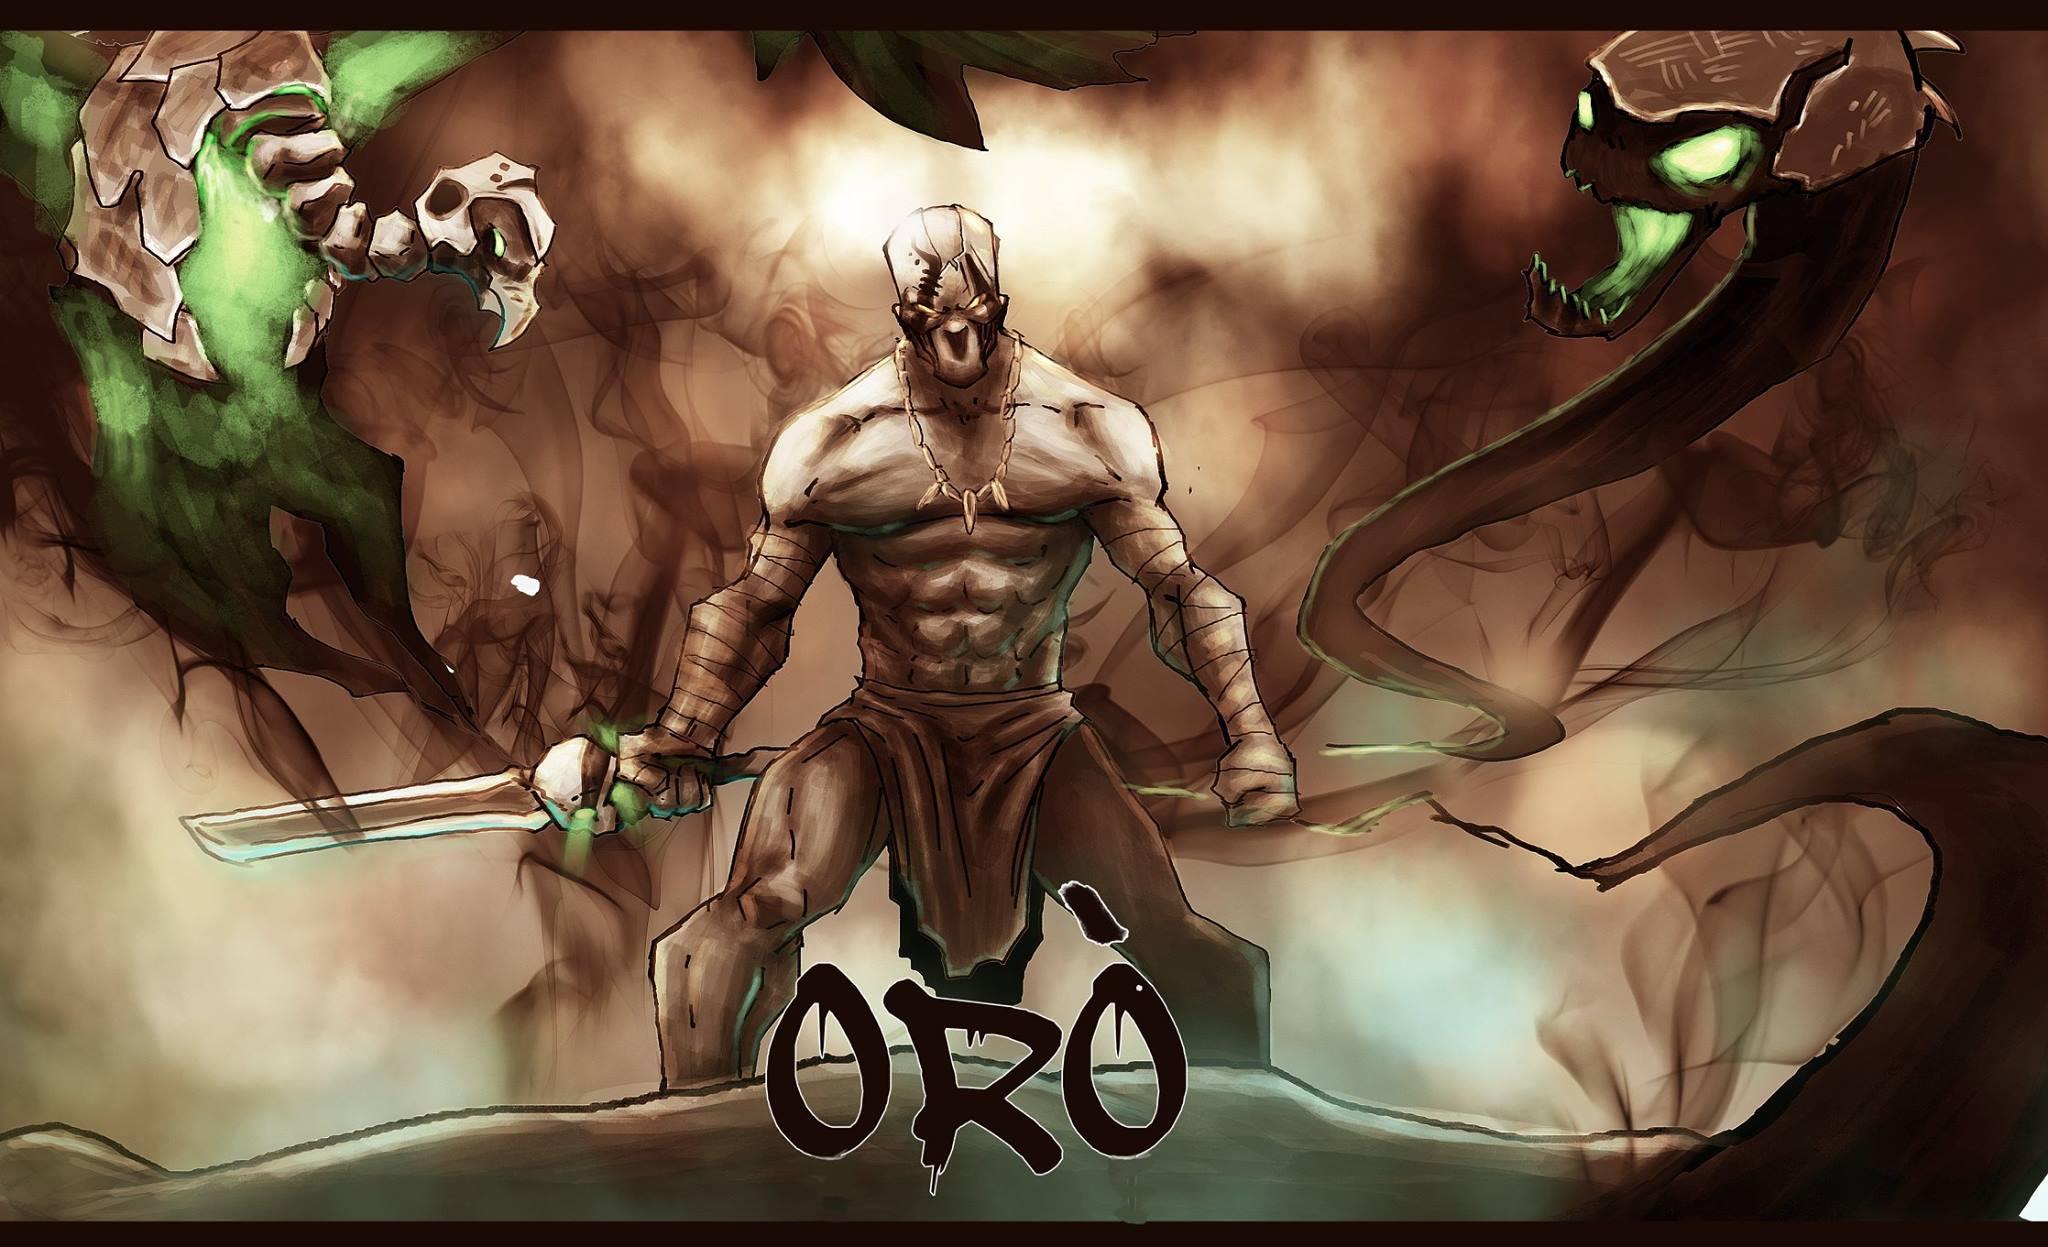 Sobolo in Squidtropolis – Conversations with MAD! Comics Writer, Hafeez Oluwa